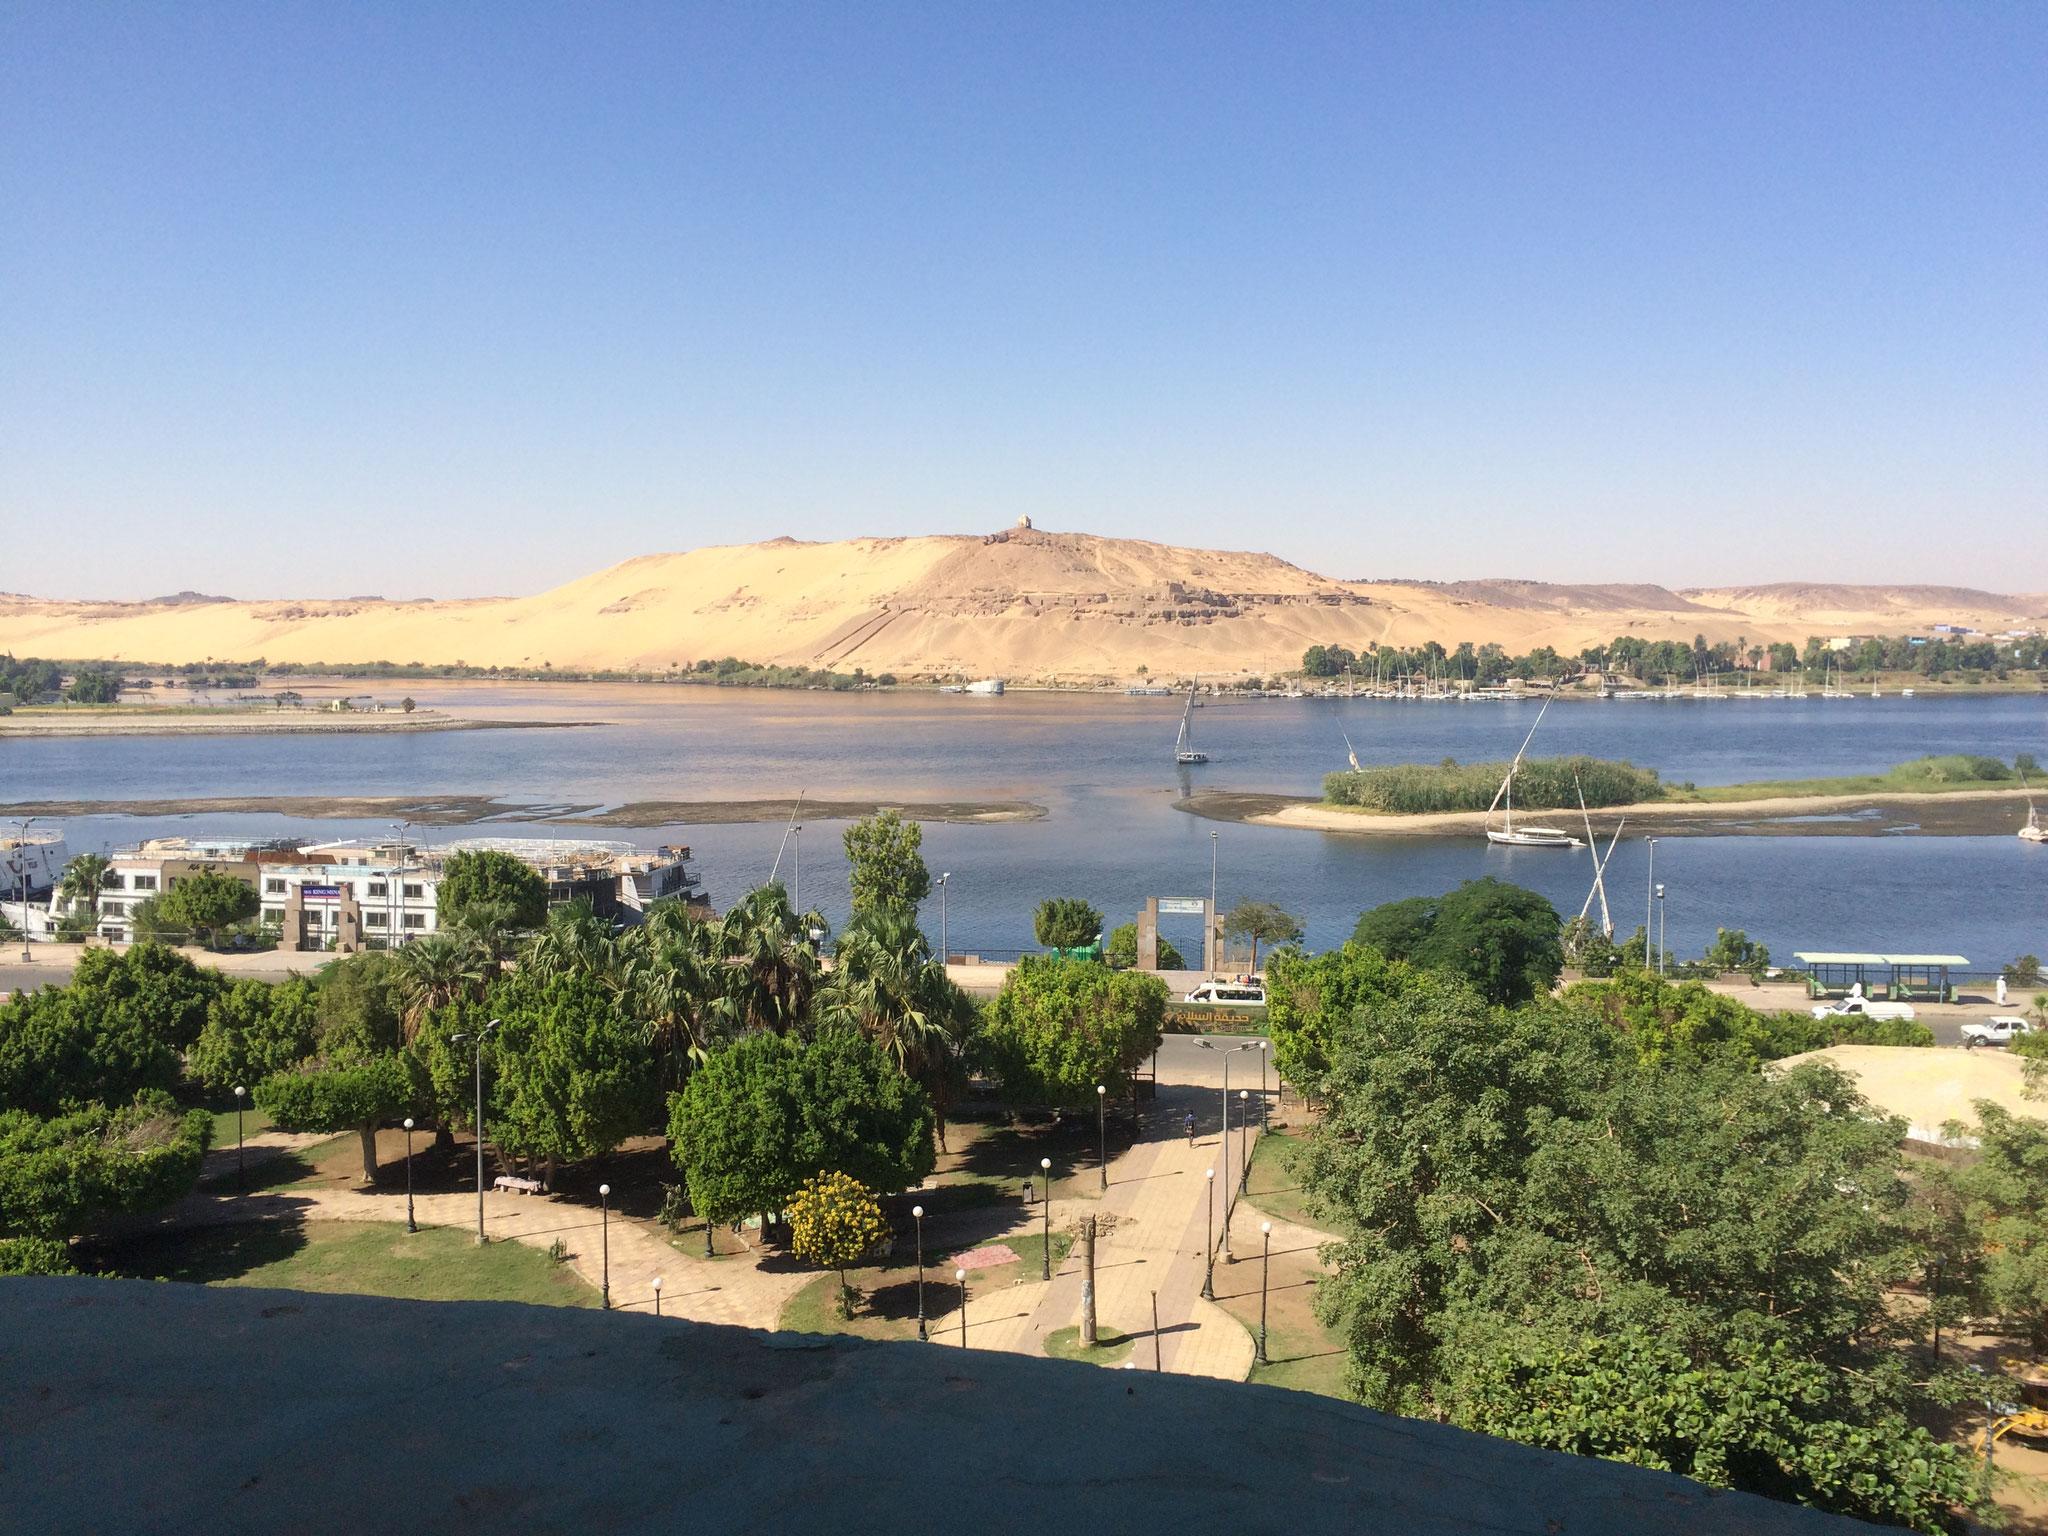 Aswan, the wonderful